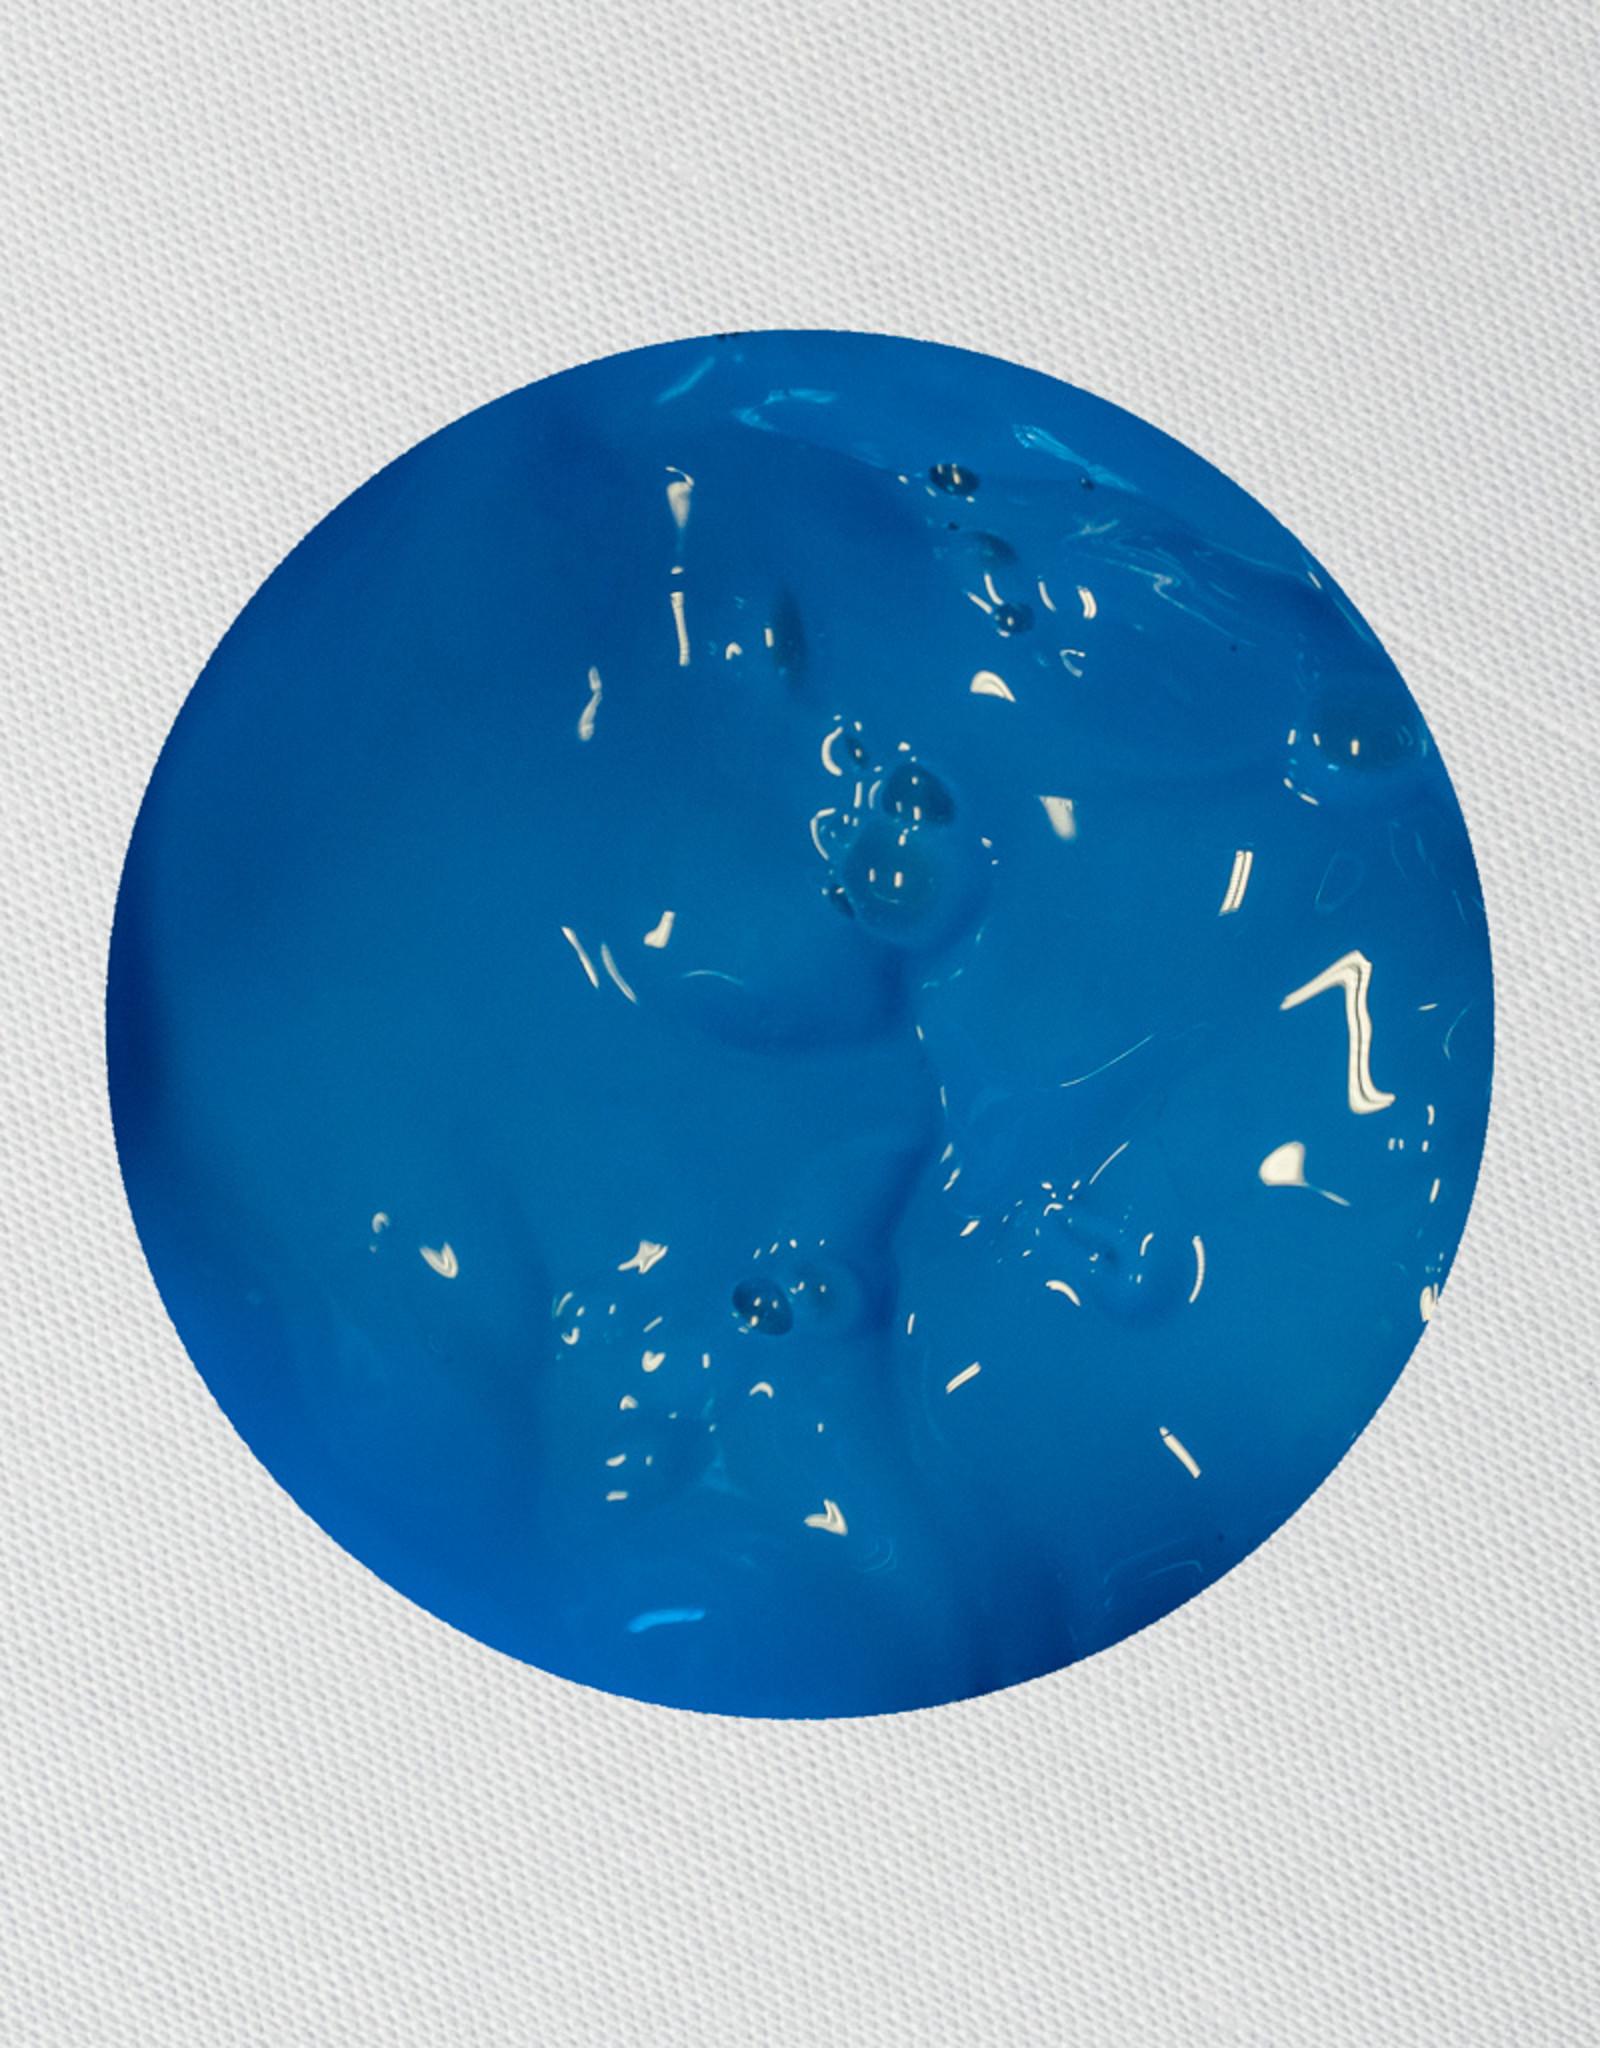 Trapsuutjies Hemelsblauw Large